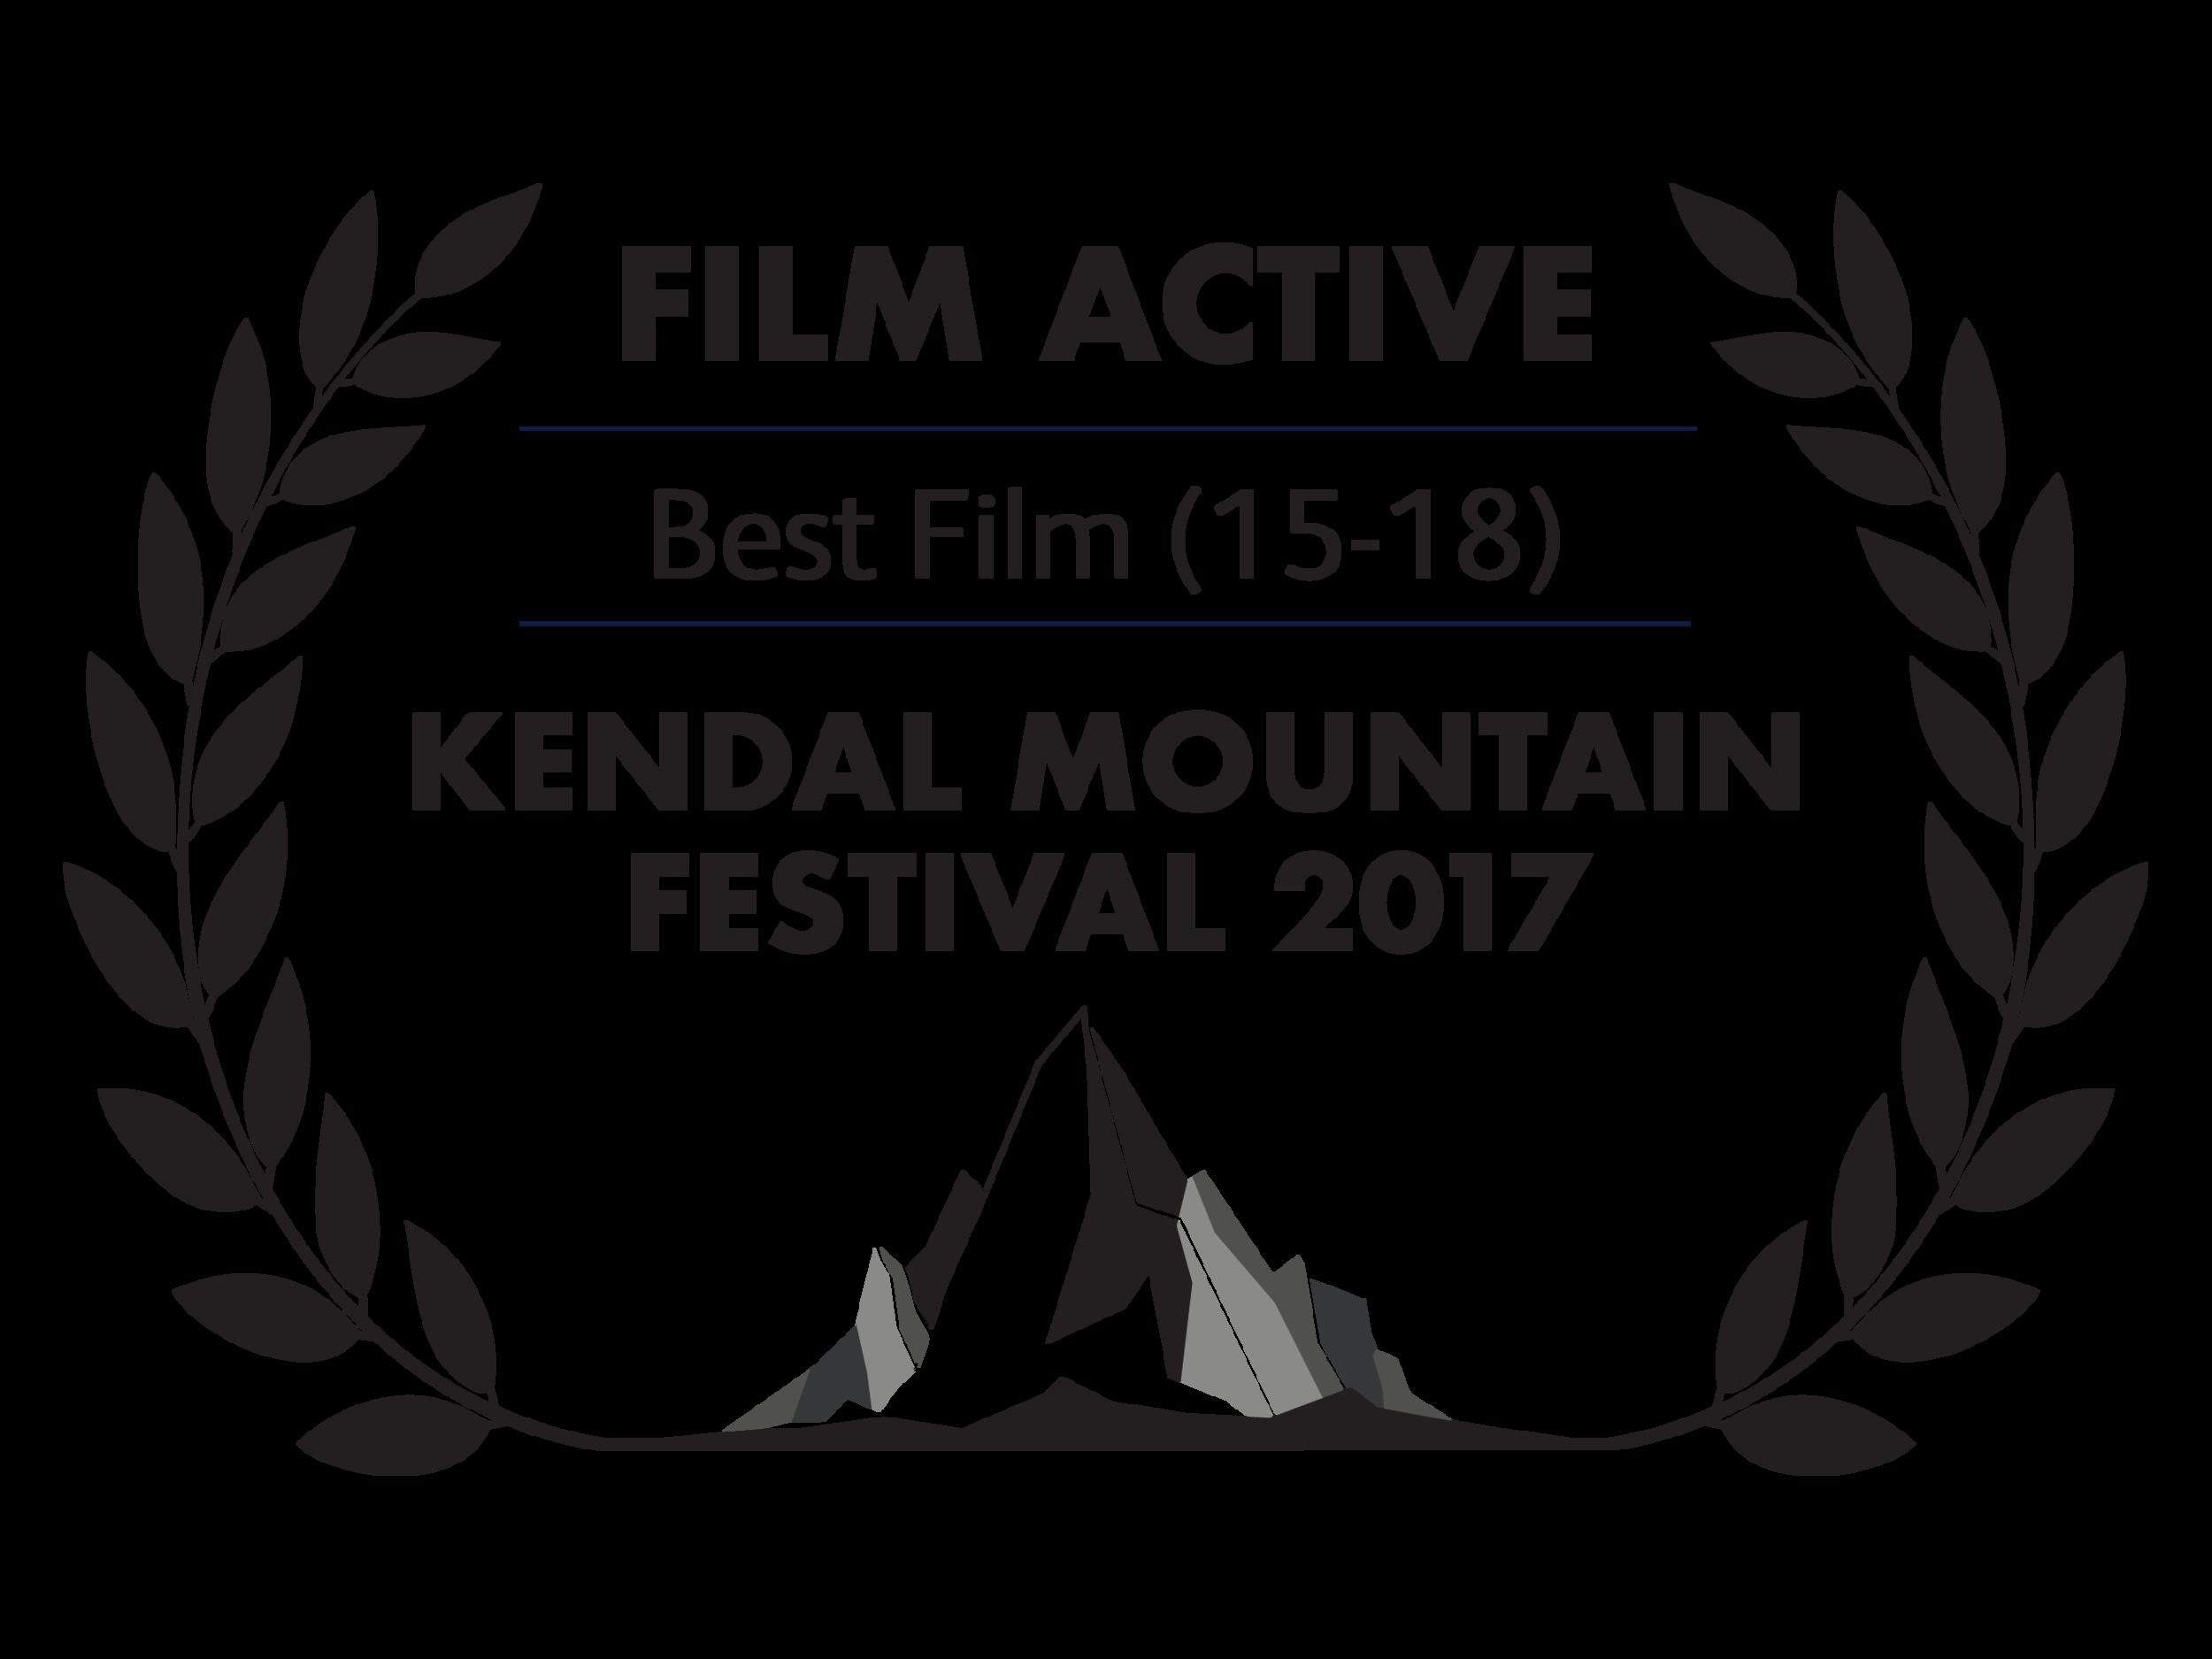 KMF LAURELS MASTER NEW 2017 FILM ACTIVE-01.png